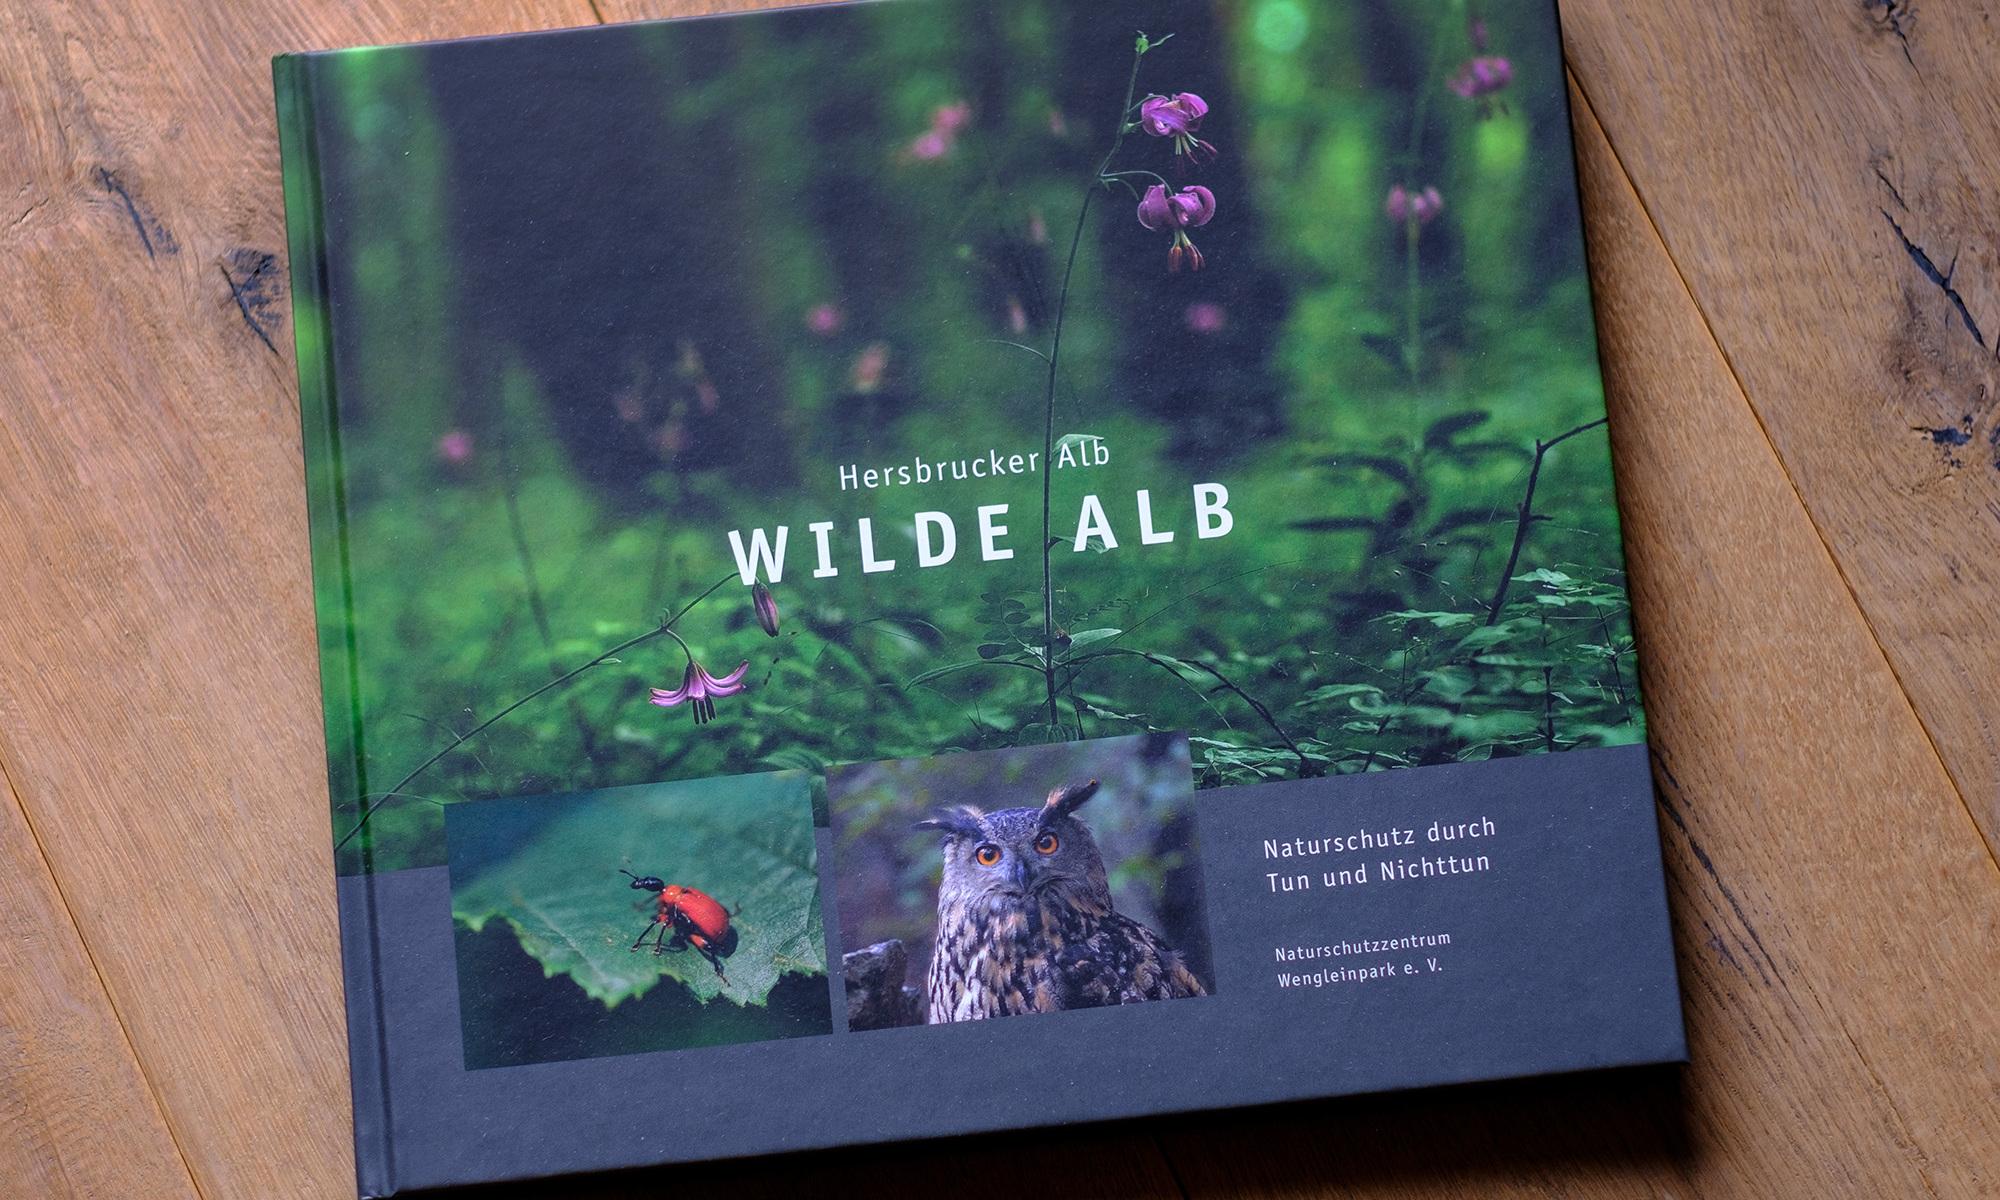 Buchtitel Hersbrucker Alb - WILDE ALB